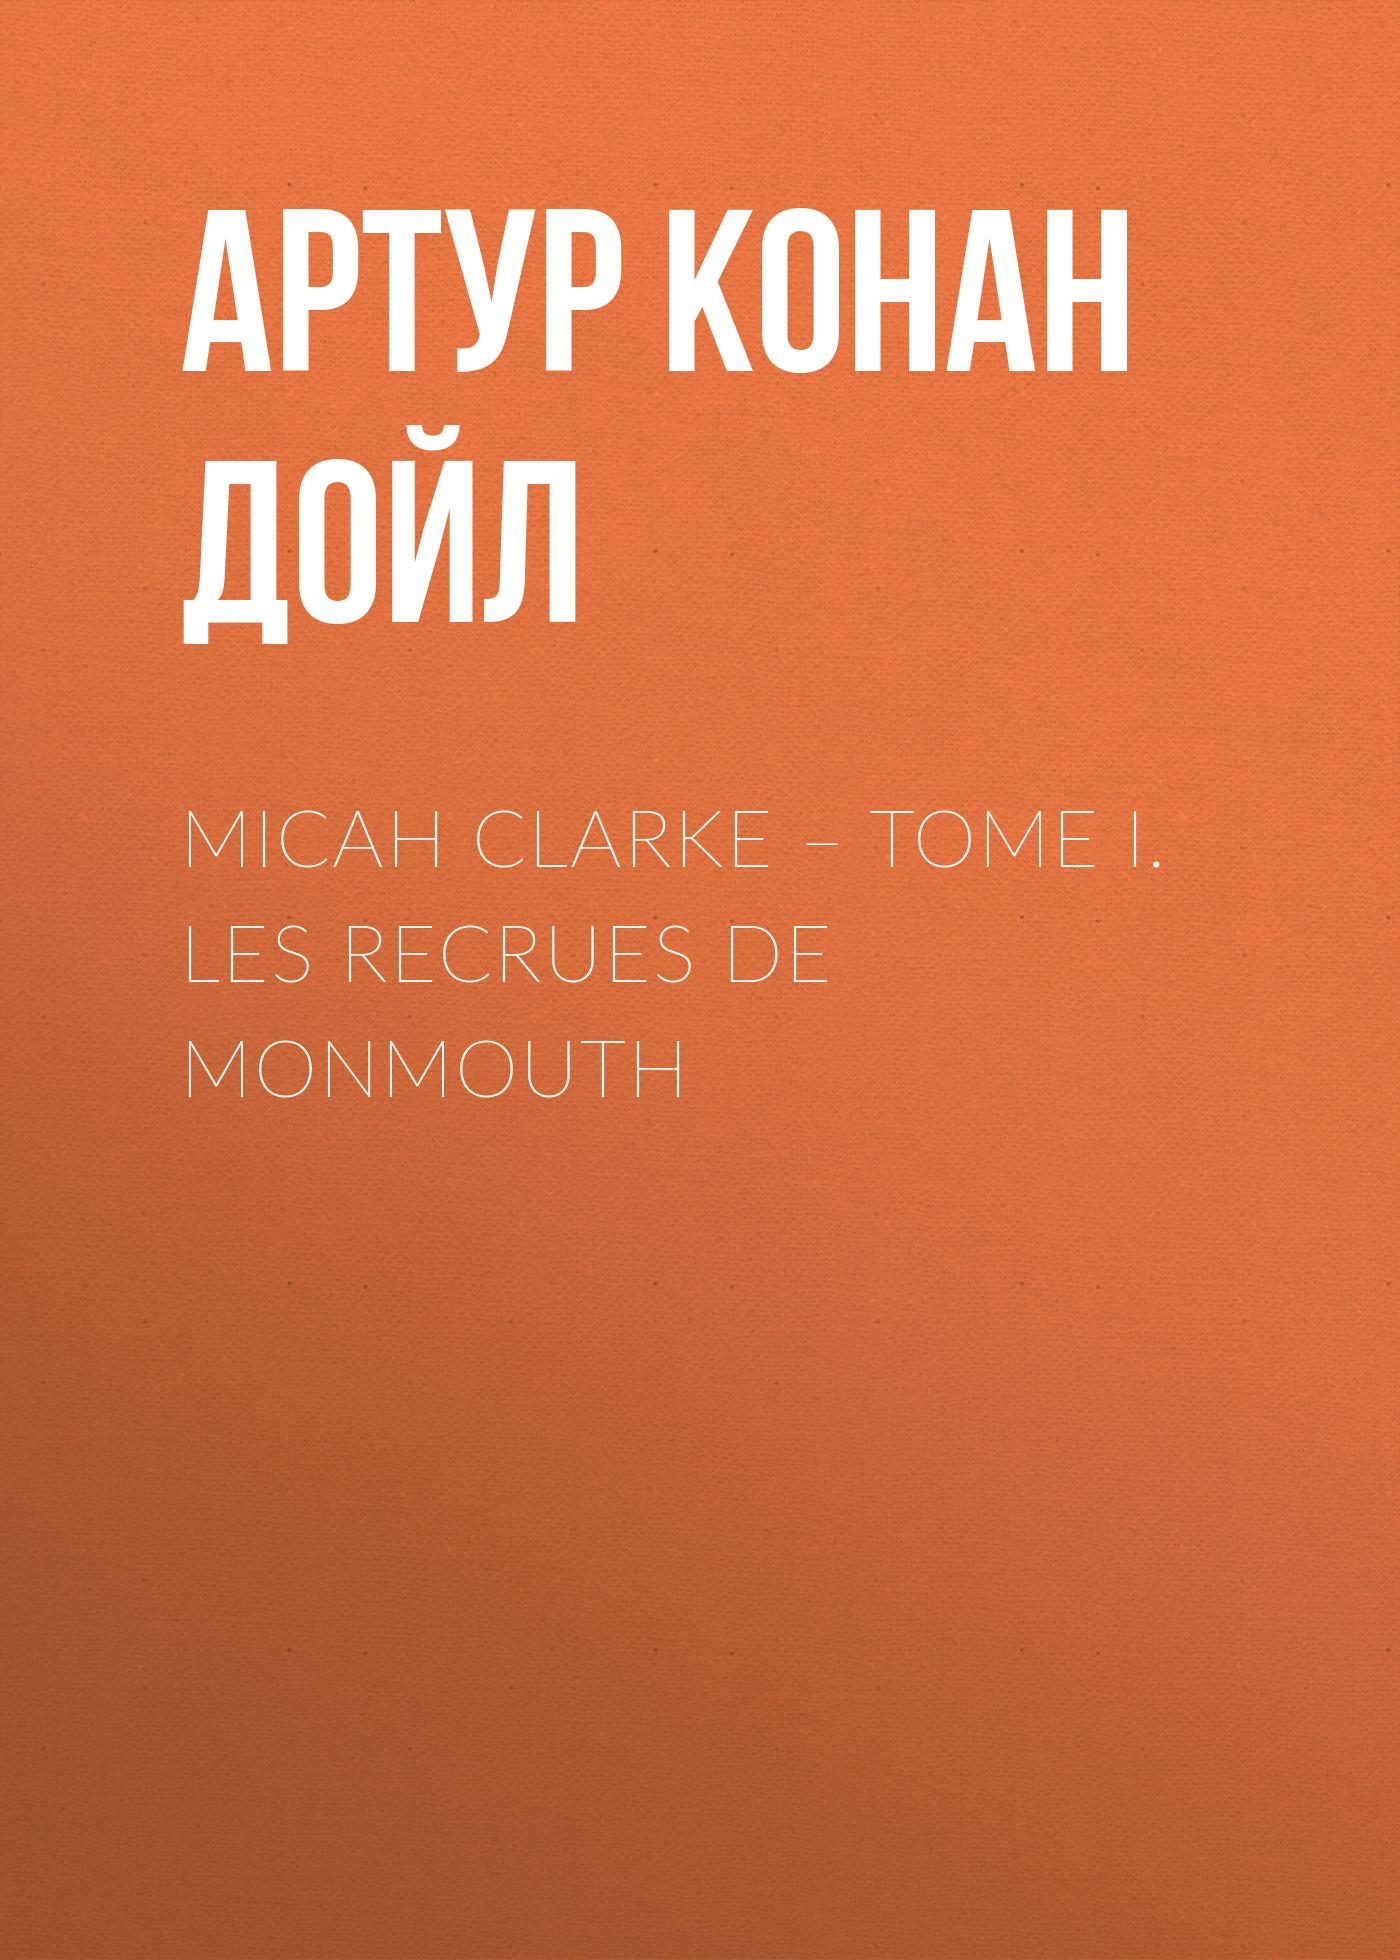 Артур Конан Дойл Micah Clarke – Tome I. Les recrues de Monmouth doyle a micah clarke ii